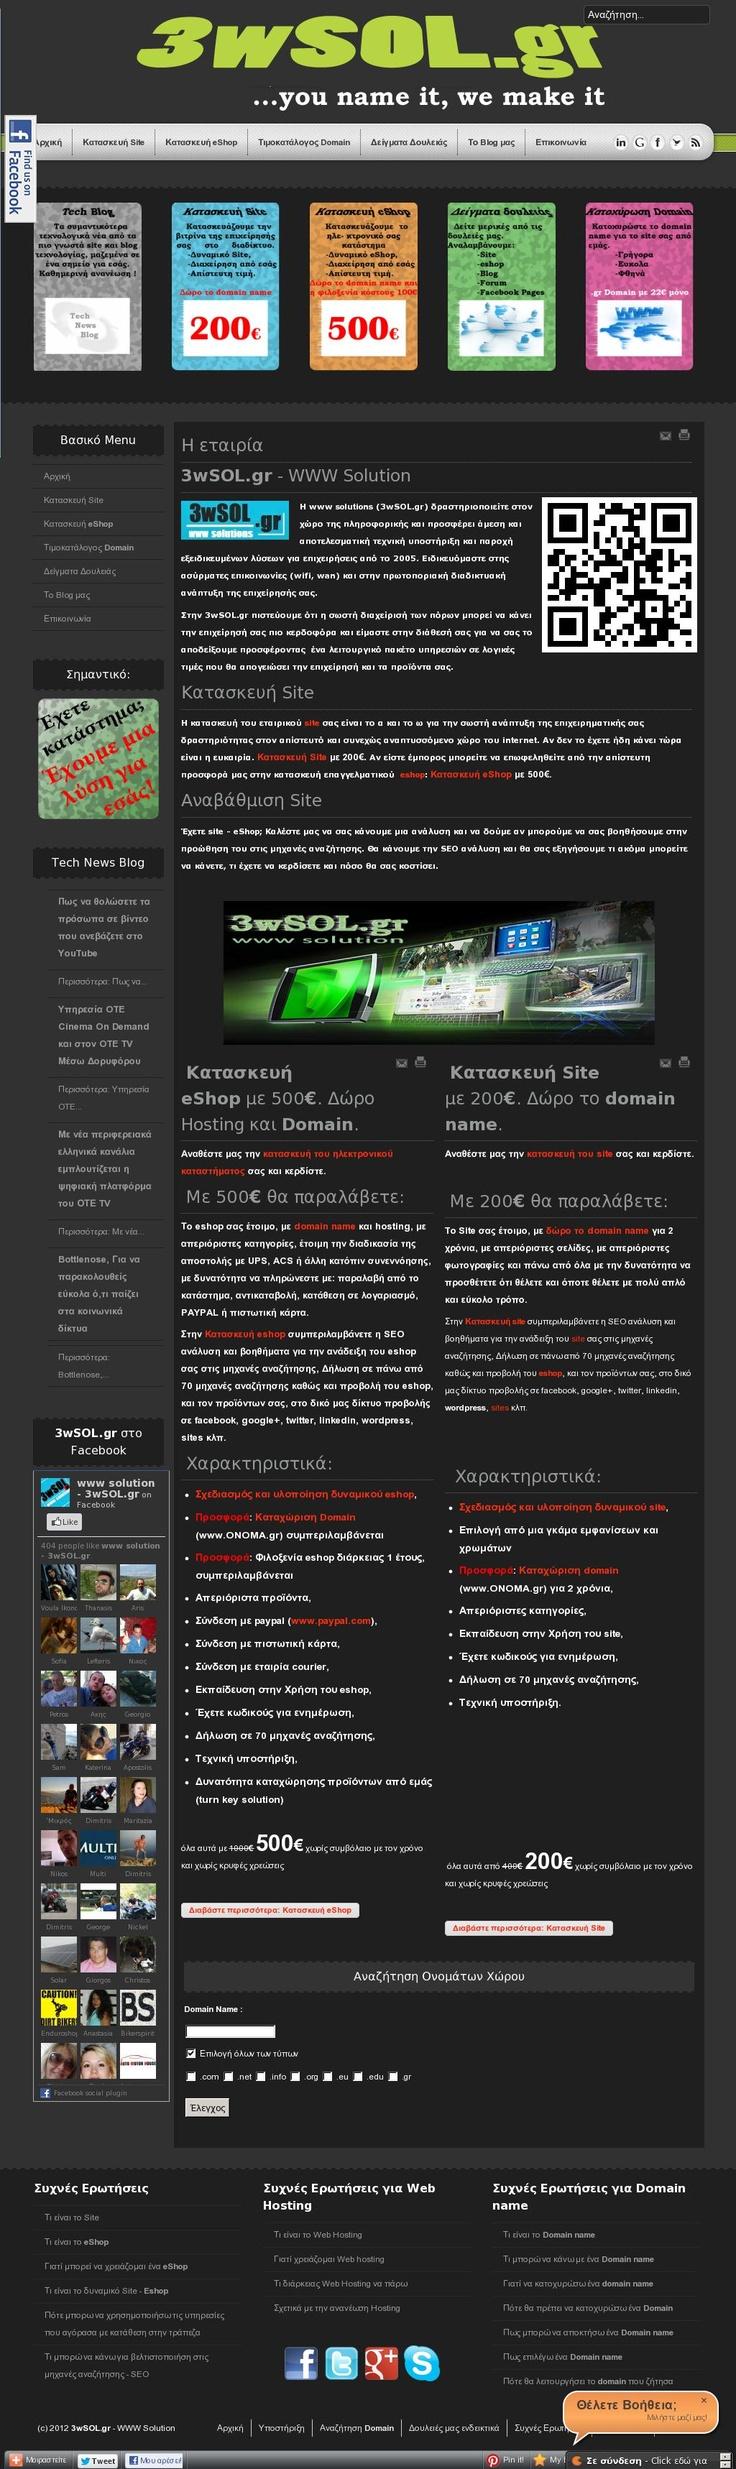 The website '3wsol.gr'. Dynamic websites, eshop, forum etc